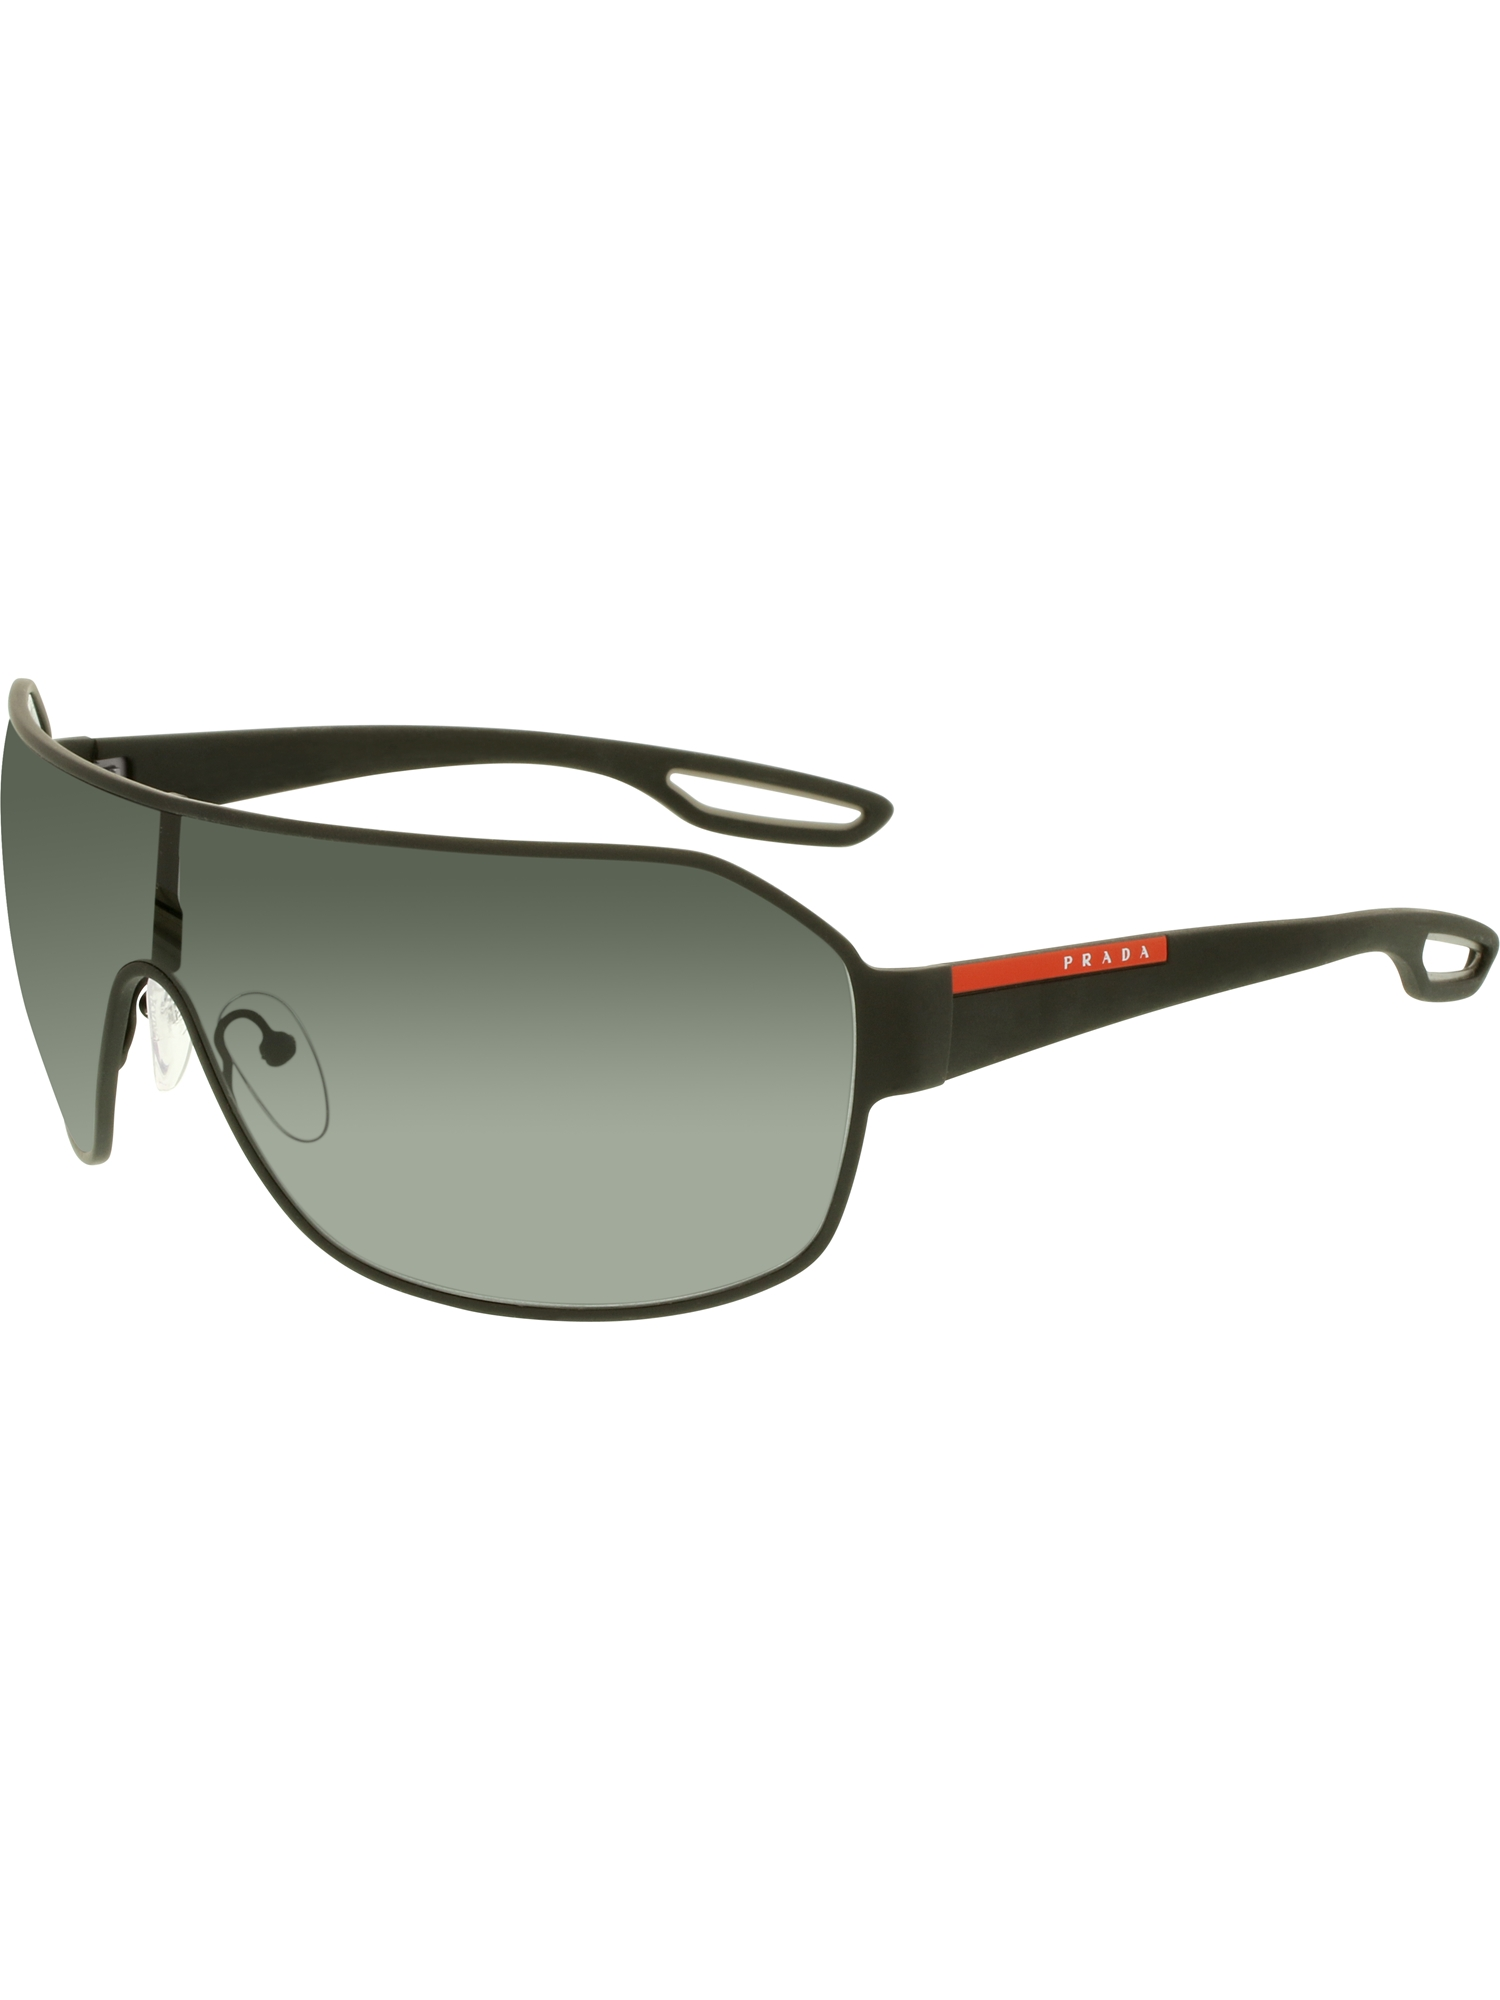 Prada Férfi Napszemüveg PS52QS-DG01A1-37 Black Shield - Glami.hu d01cb7245b